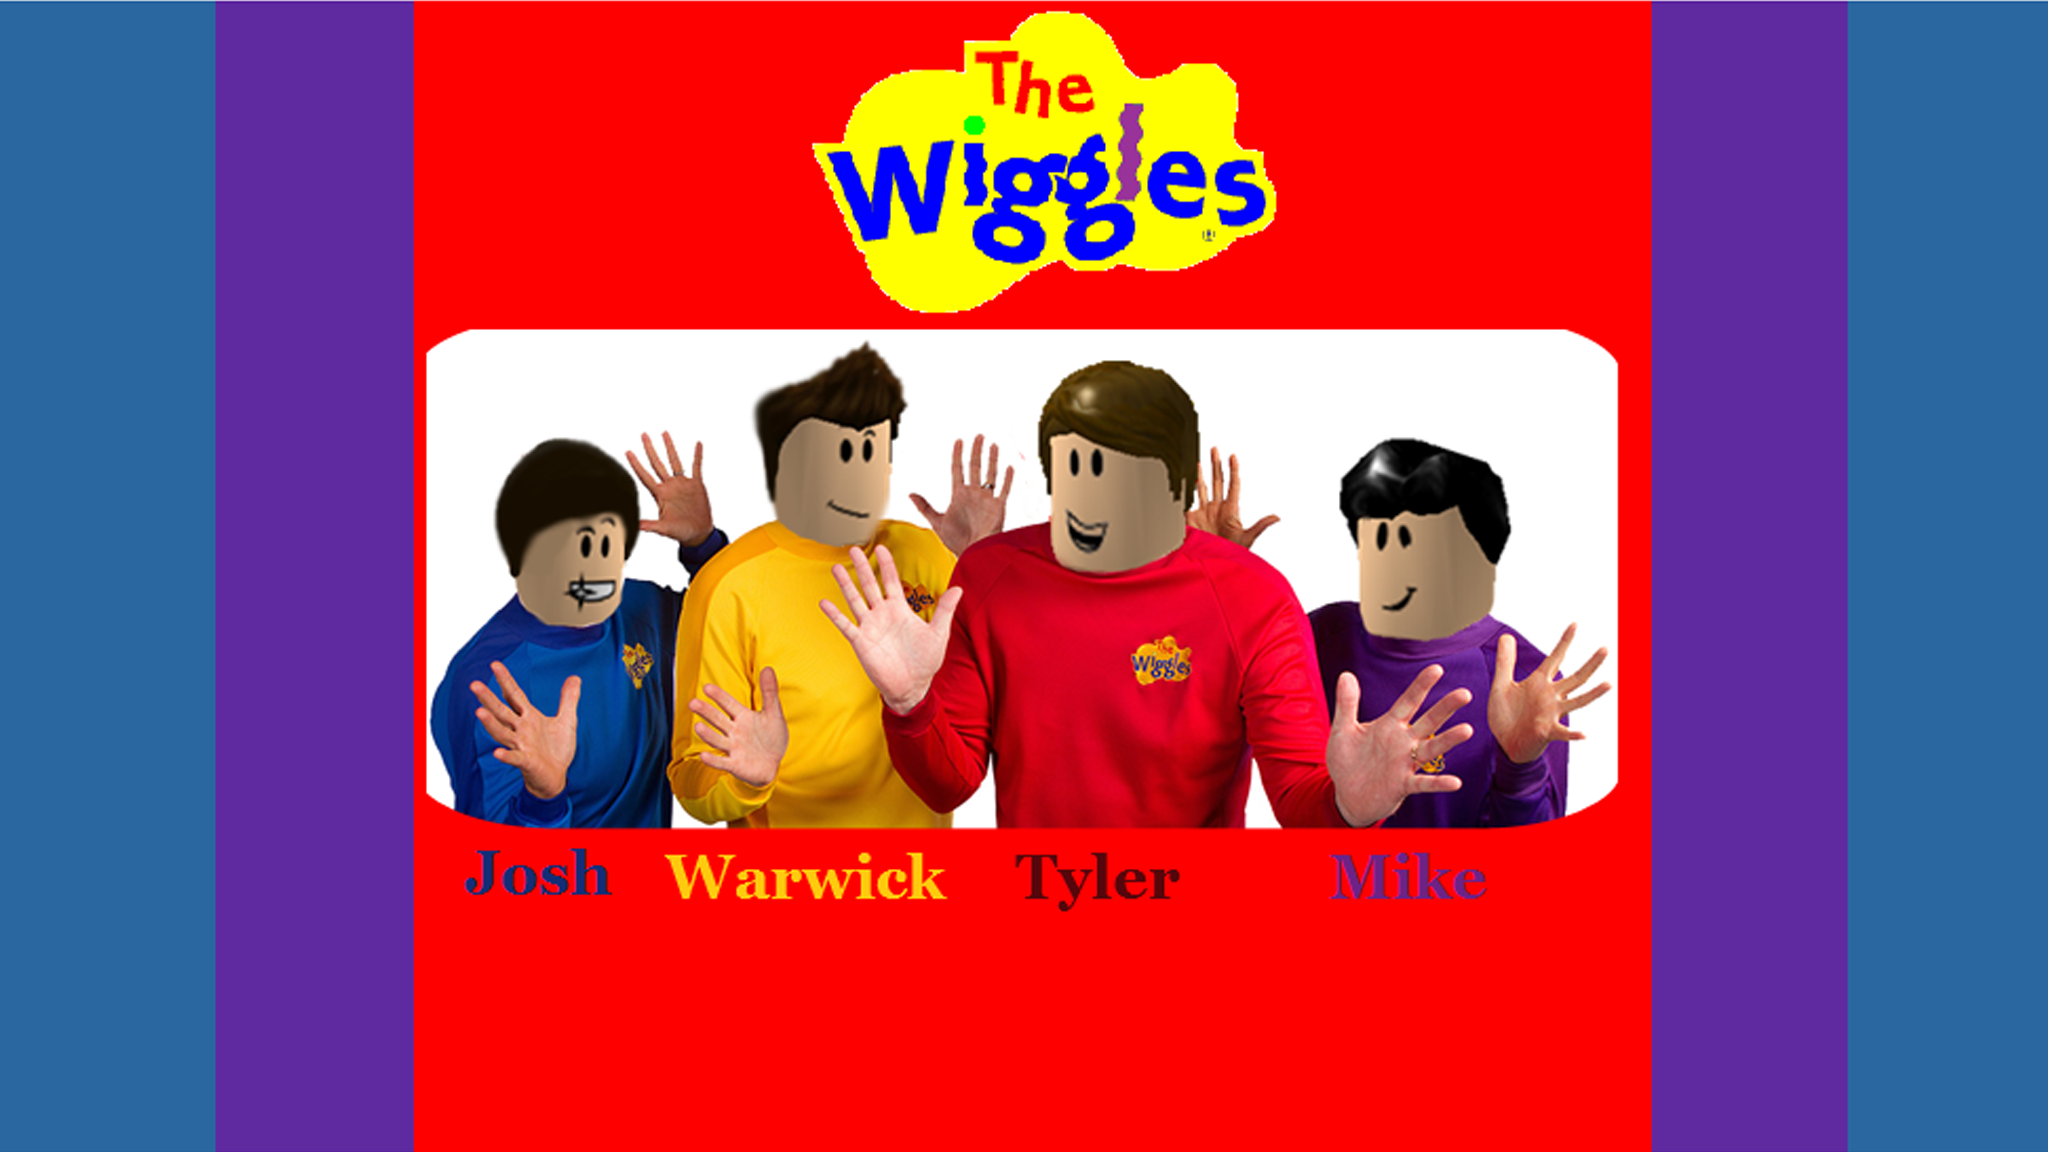 Roblox Wallpaper 2014 The wiggles roblox 2048x1152